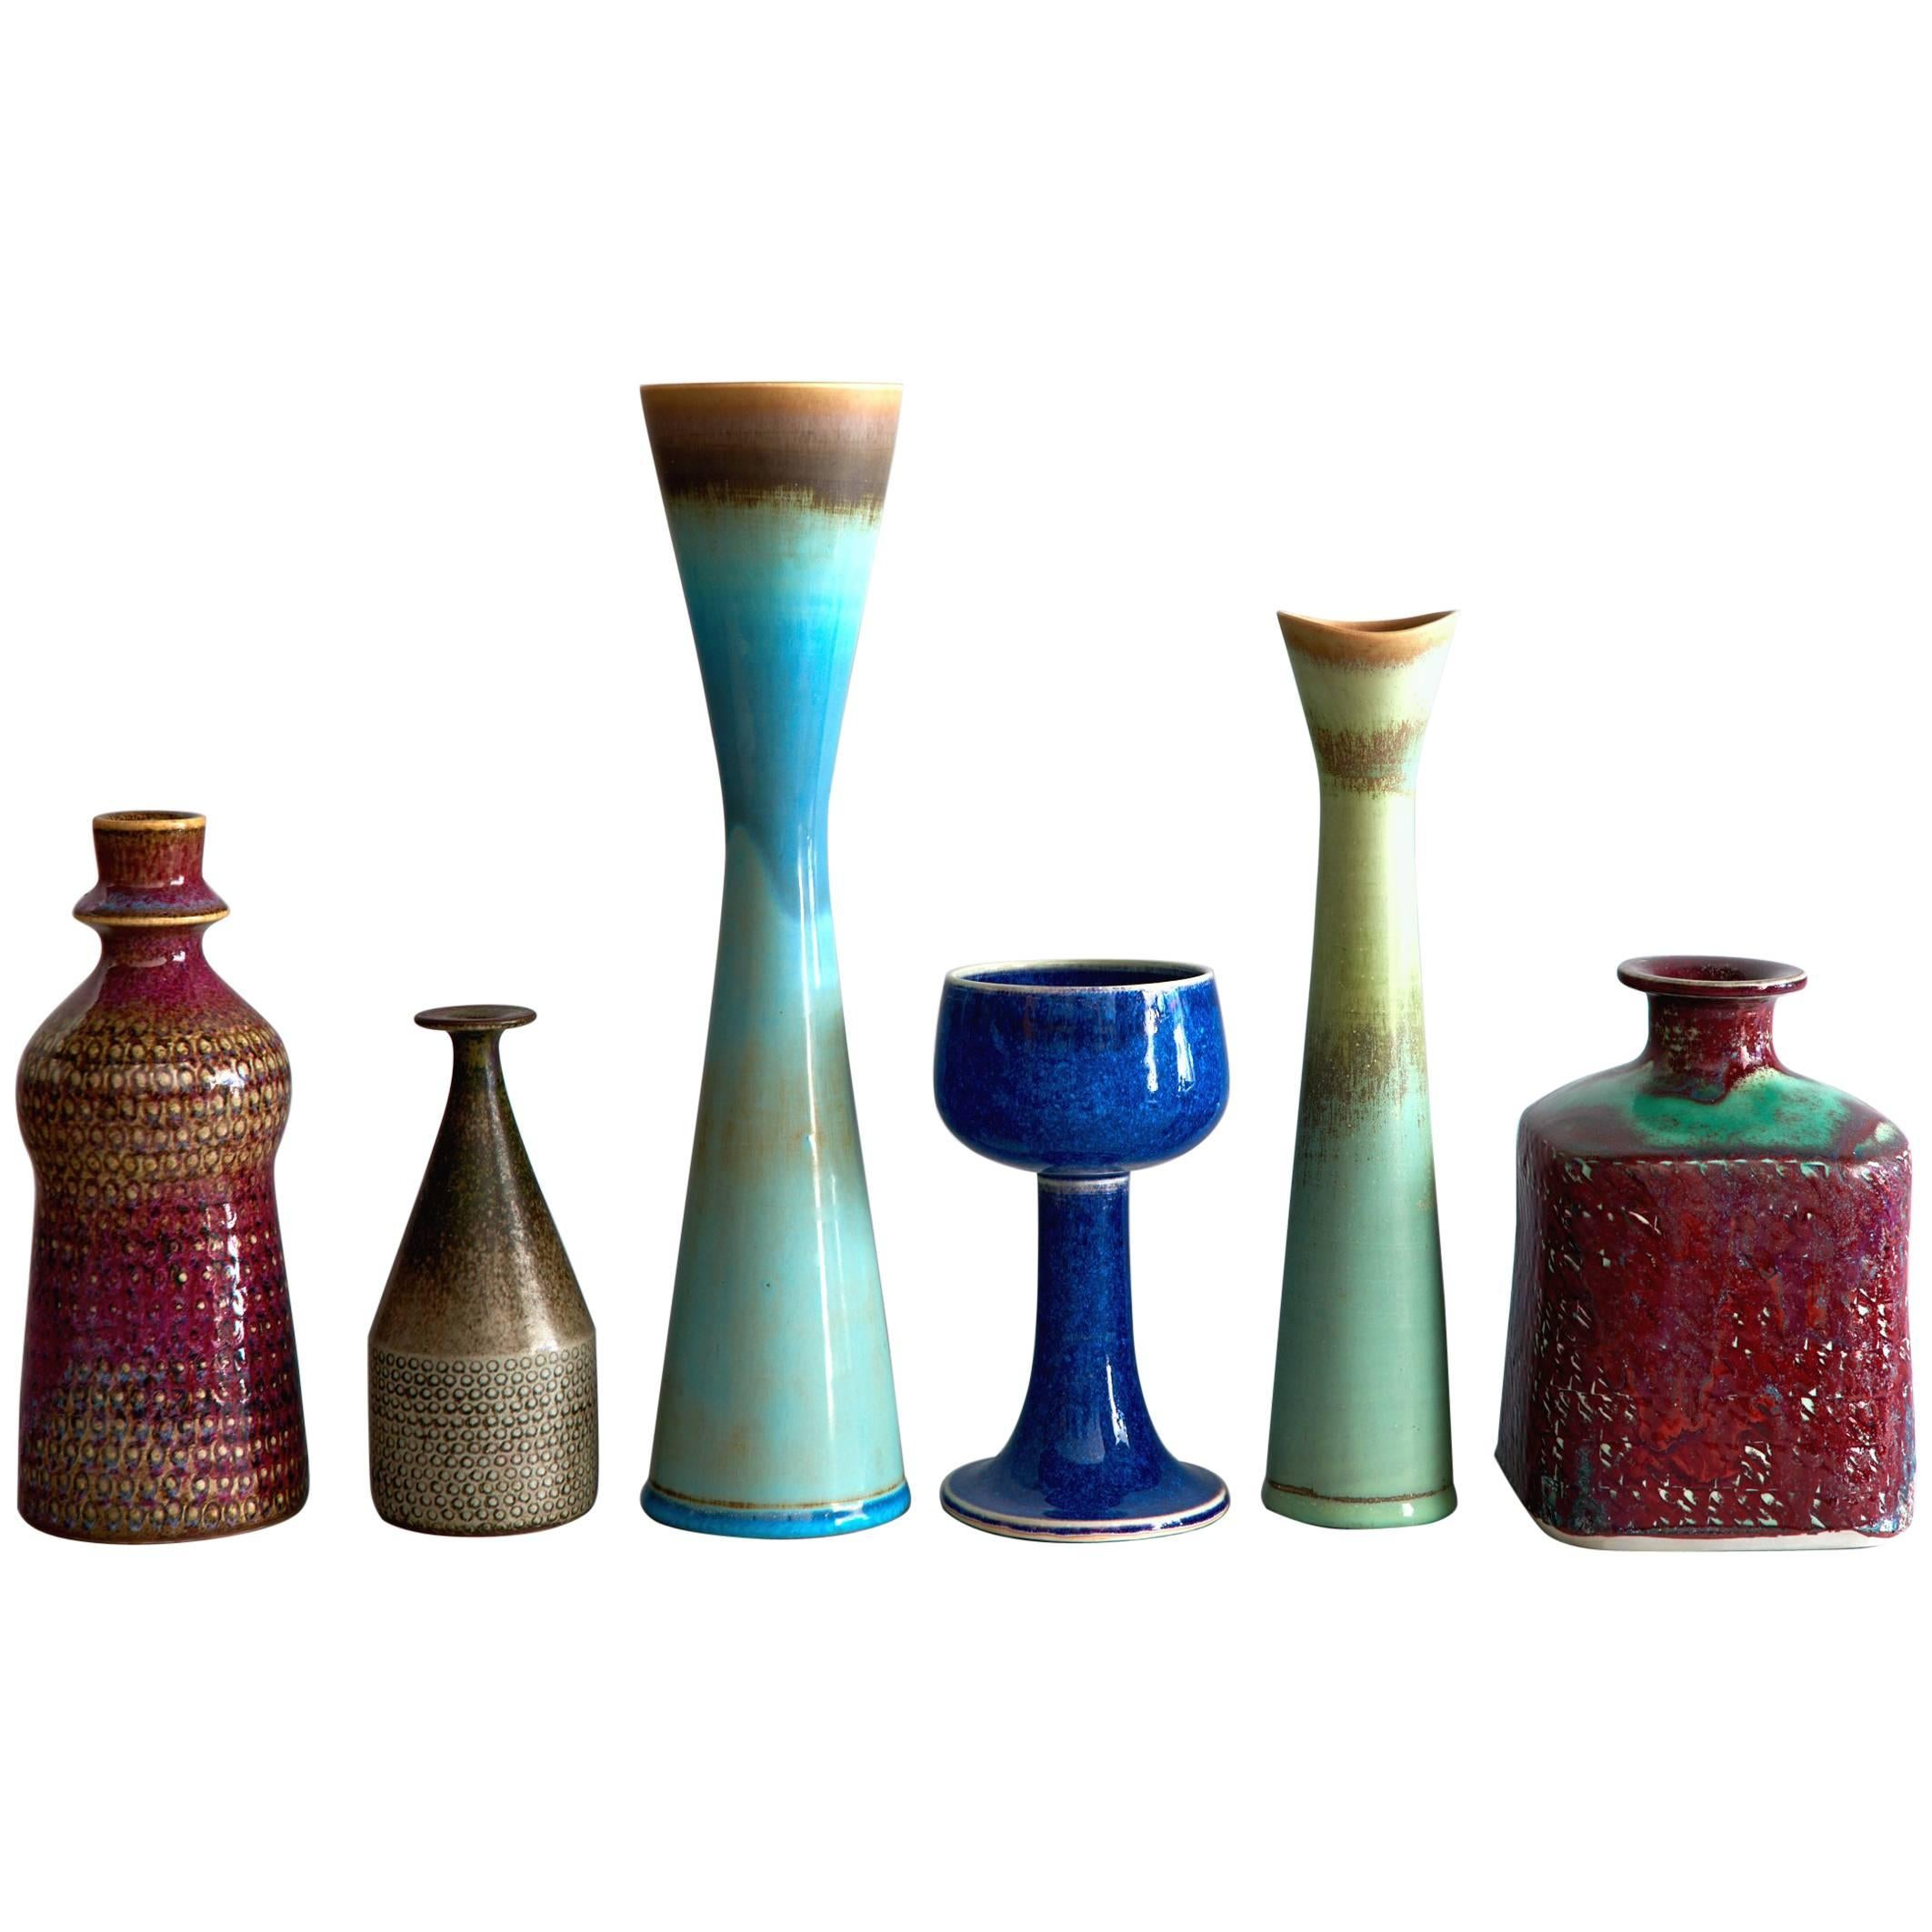 Six Studio Vases by Stig Lindberg